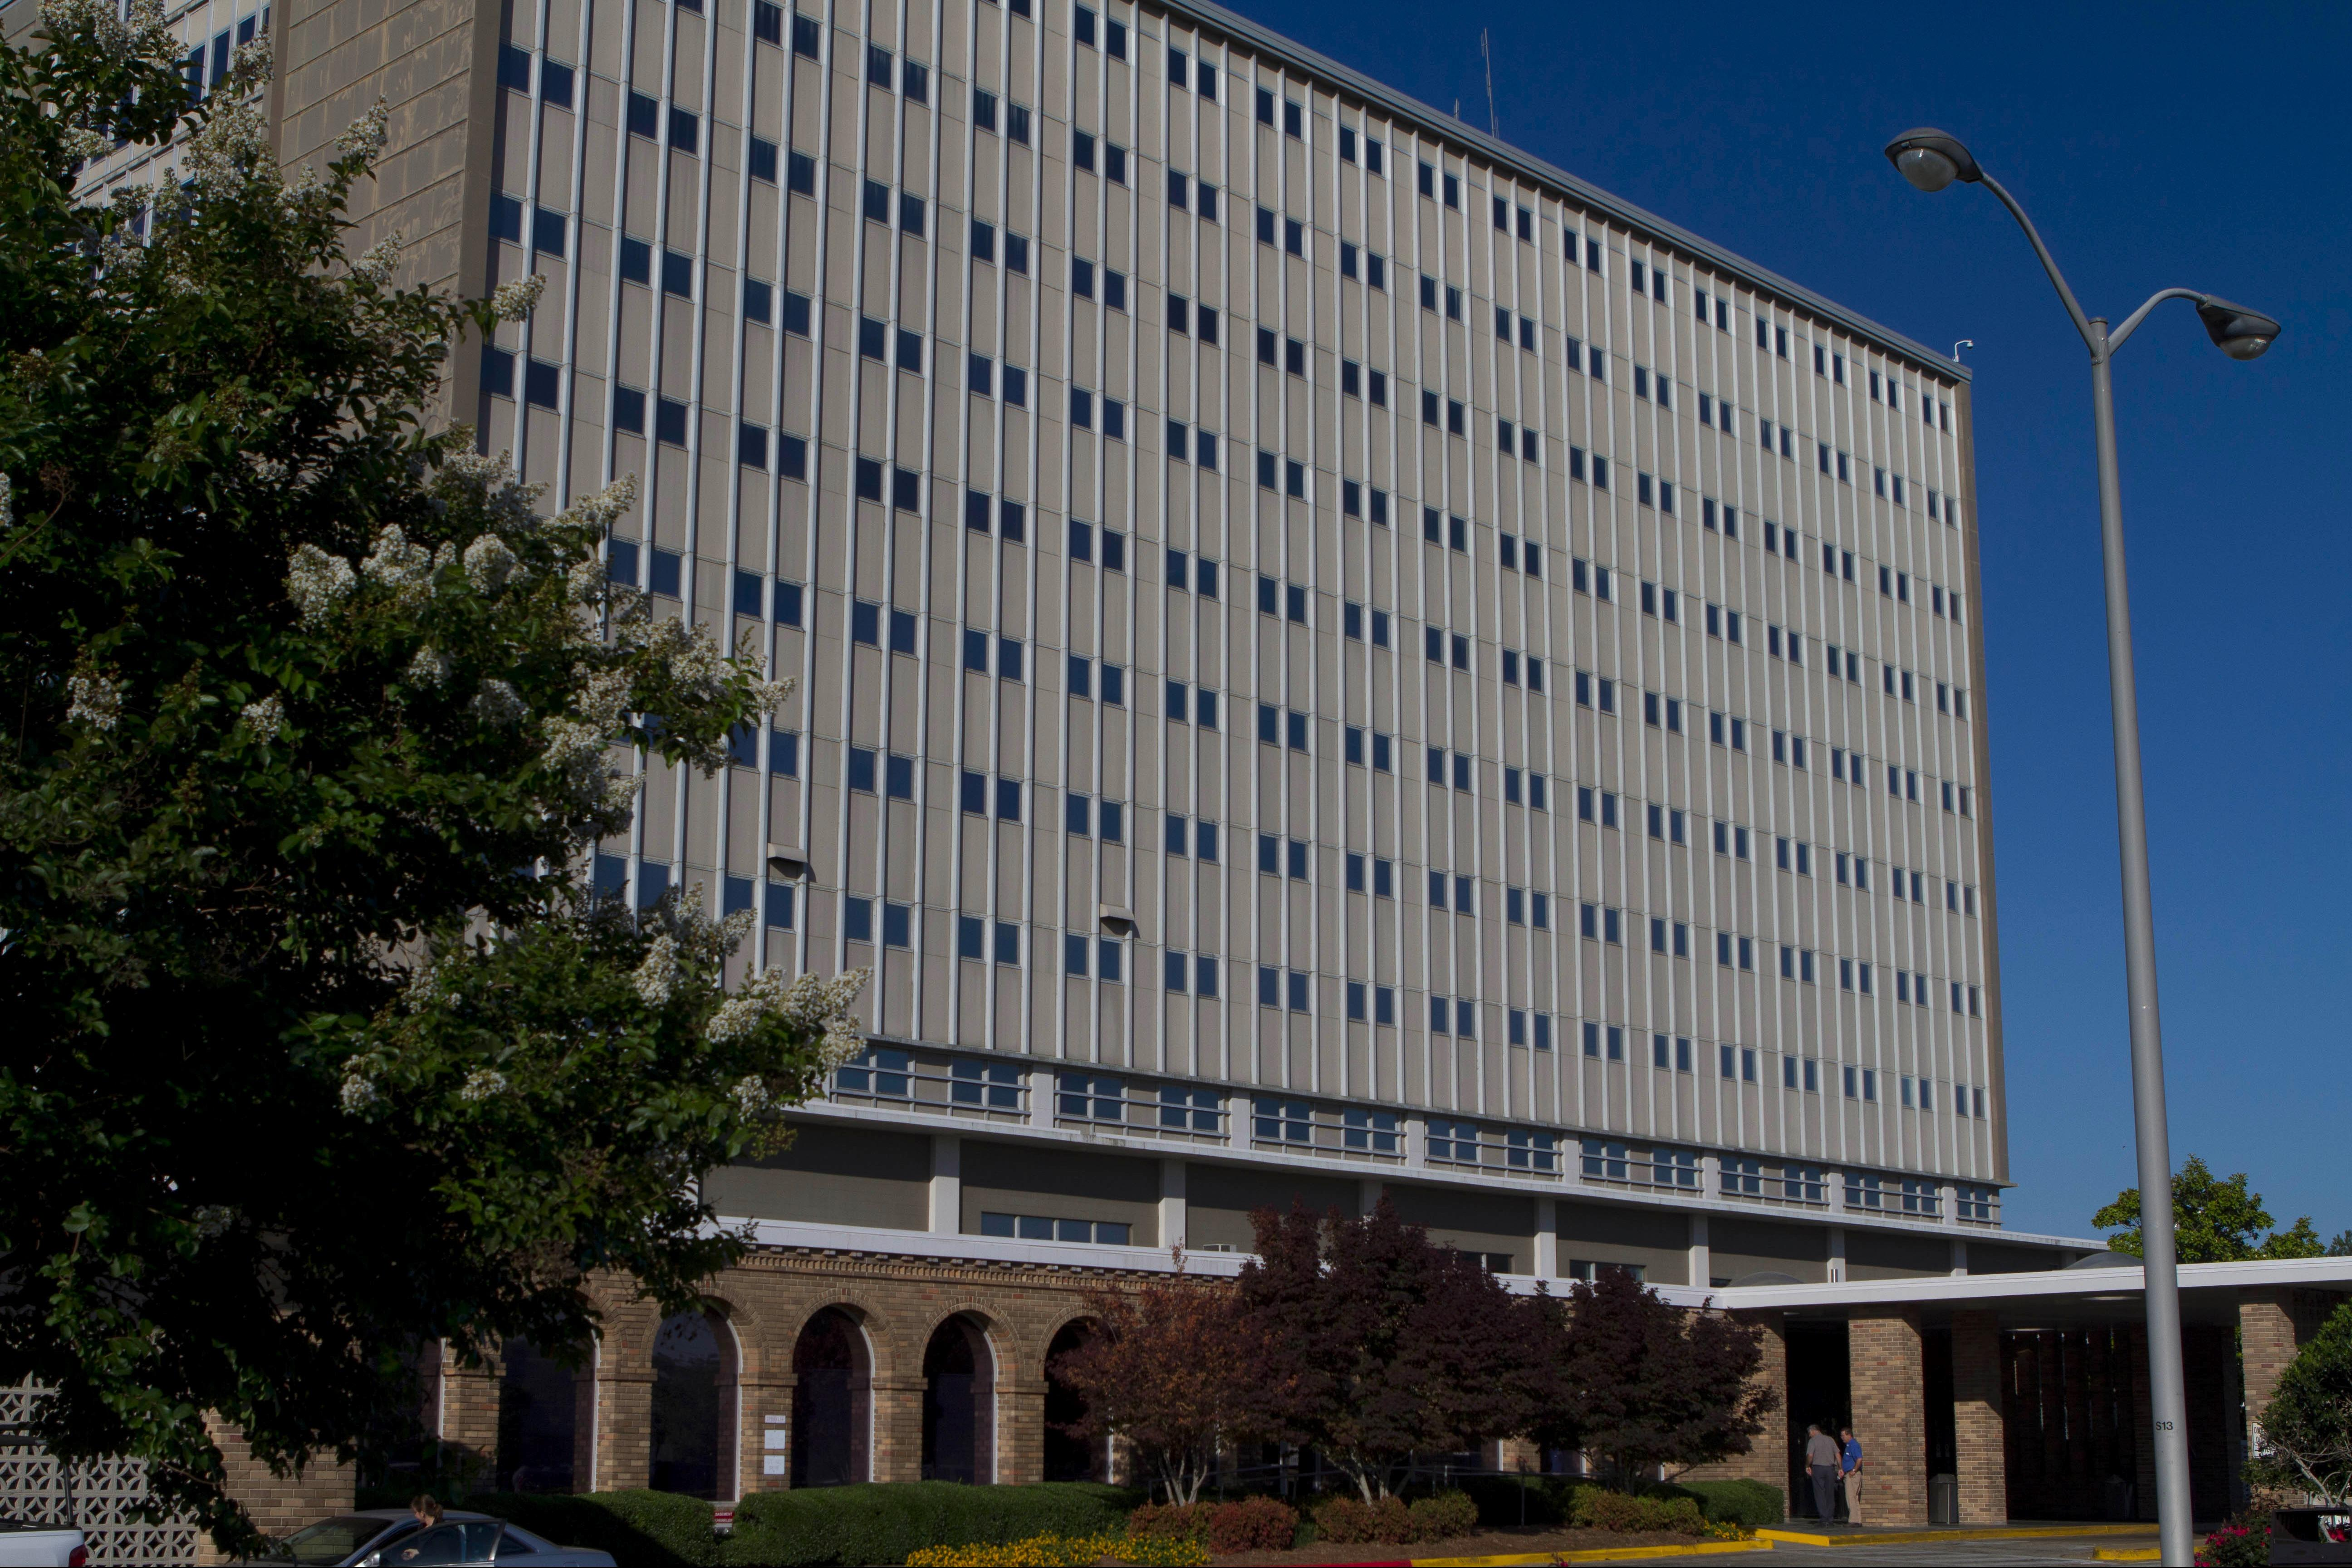 Springhill Medical Center Emergency Room